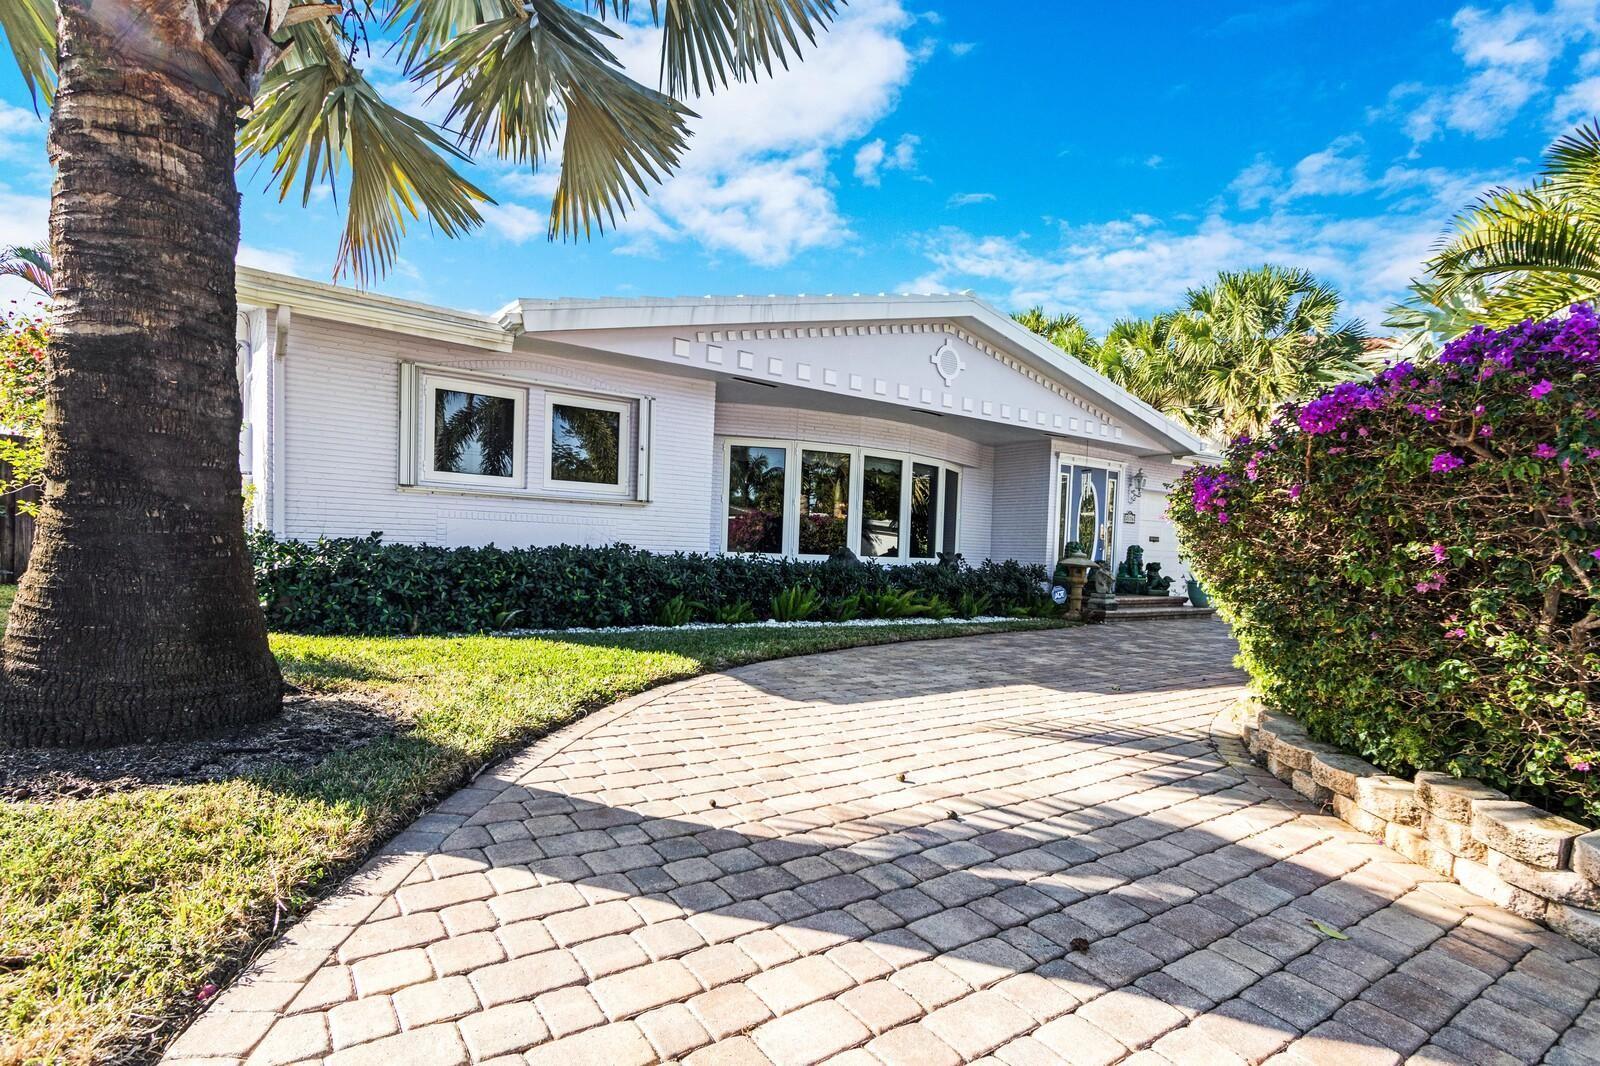 2176 NE 62 Court, Fort Lauderdale, FL 33308 - #: RX-10684256